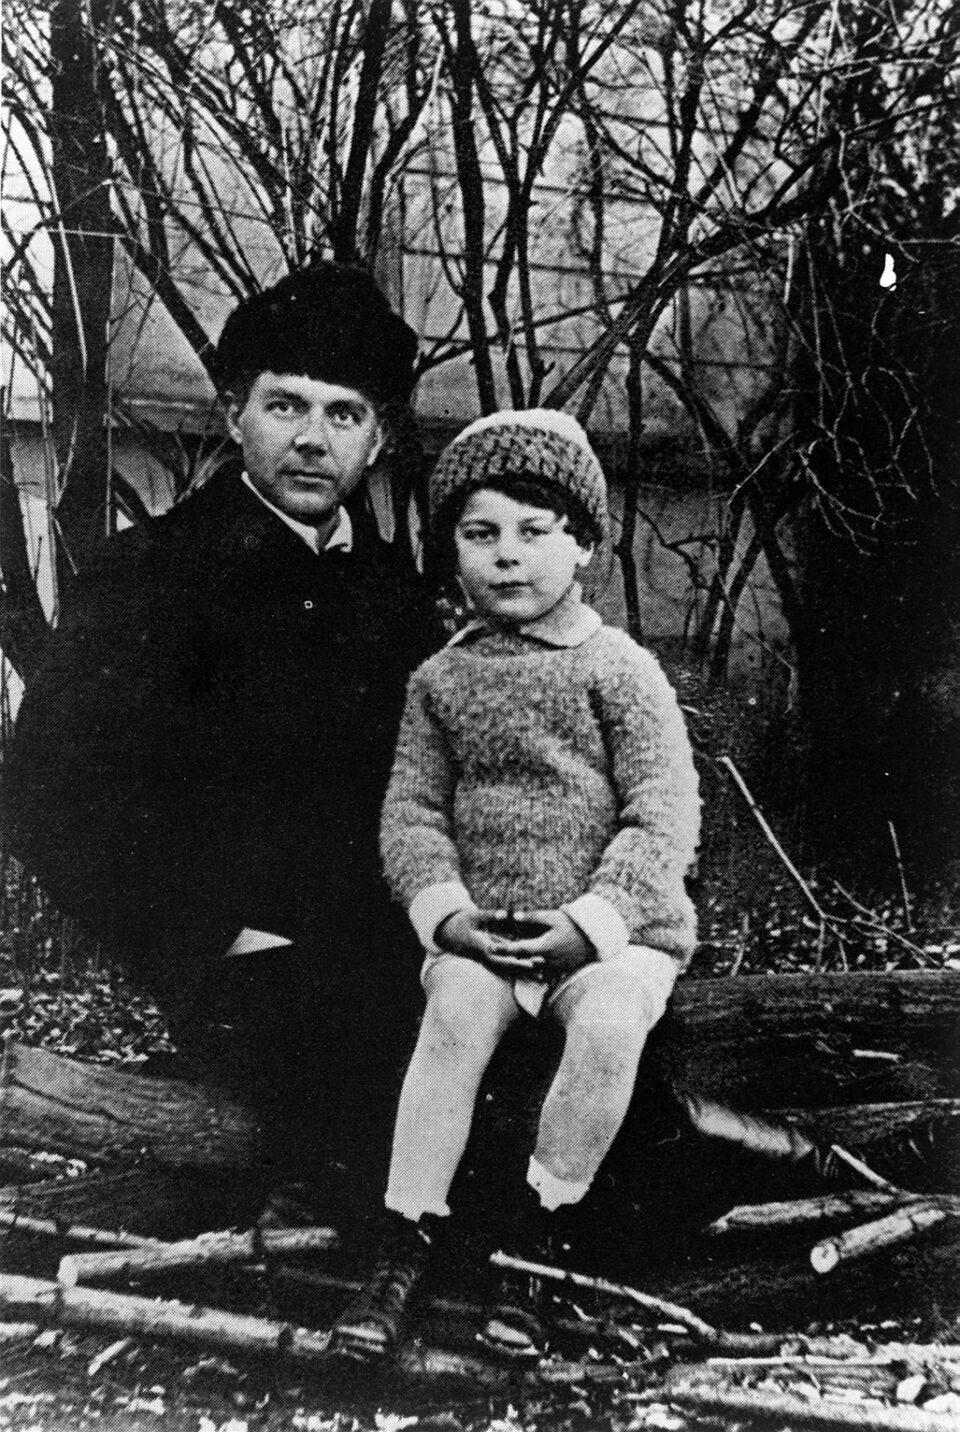 Béla Bartók (1881-1945): Sonatas para Violino e Piano Nros. 1 e 2 / Sonata para Violino Solo (Kremer, Smirnov, Kovács) #BRTK140 Vol. 5 de 29